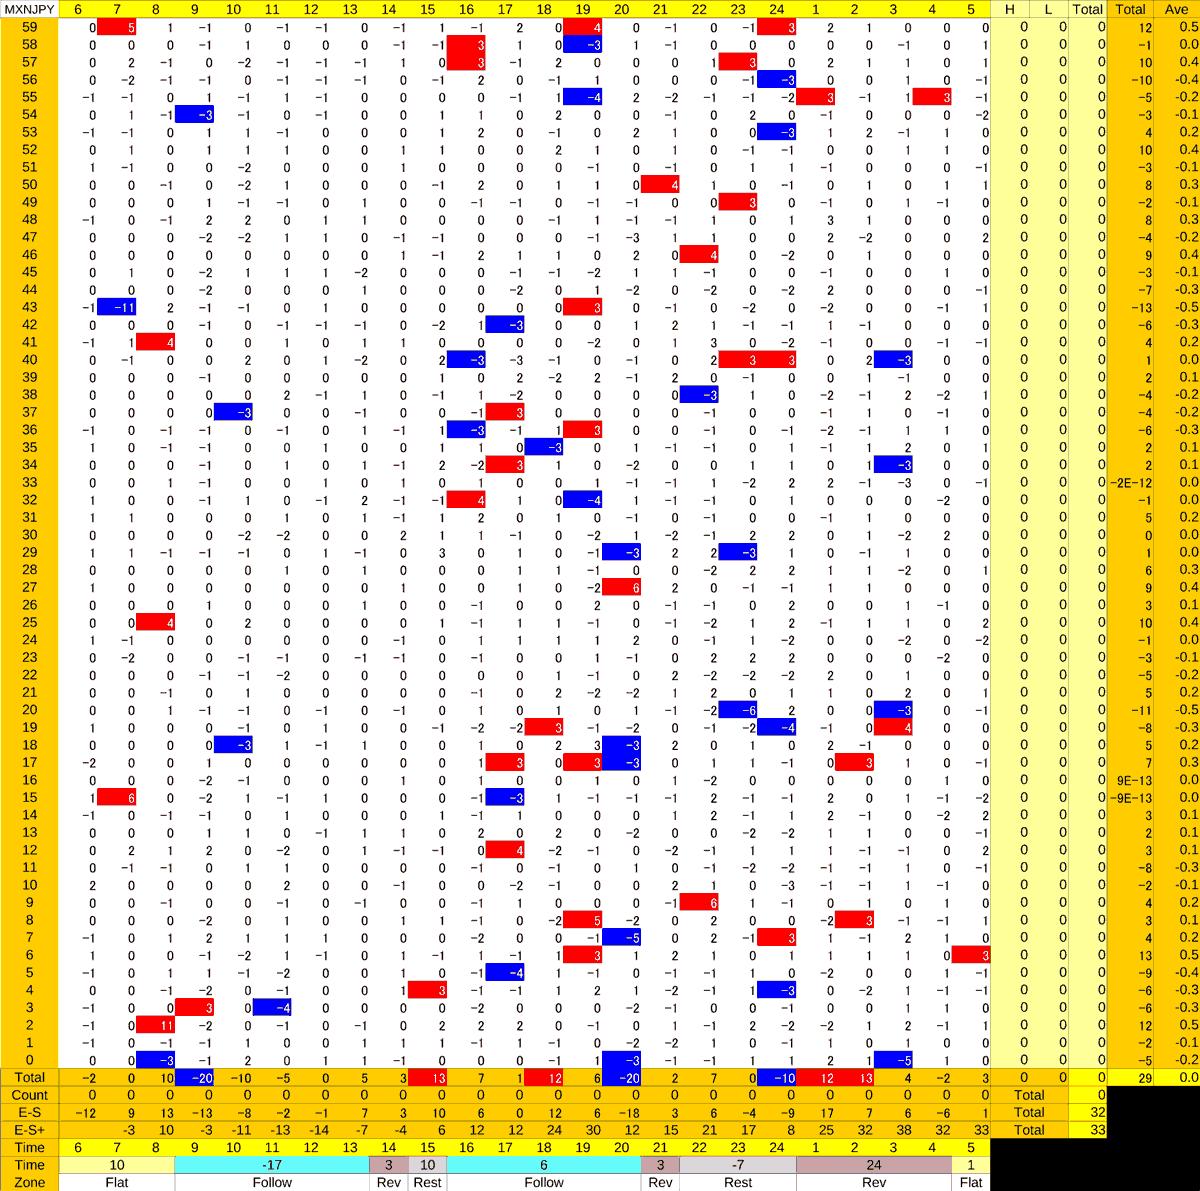 20201113_HS(3)MXNJPY